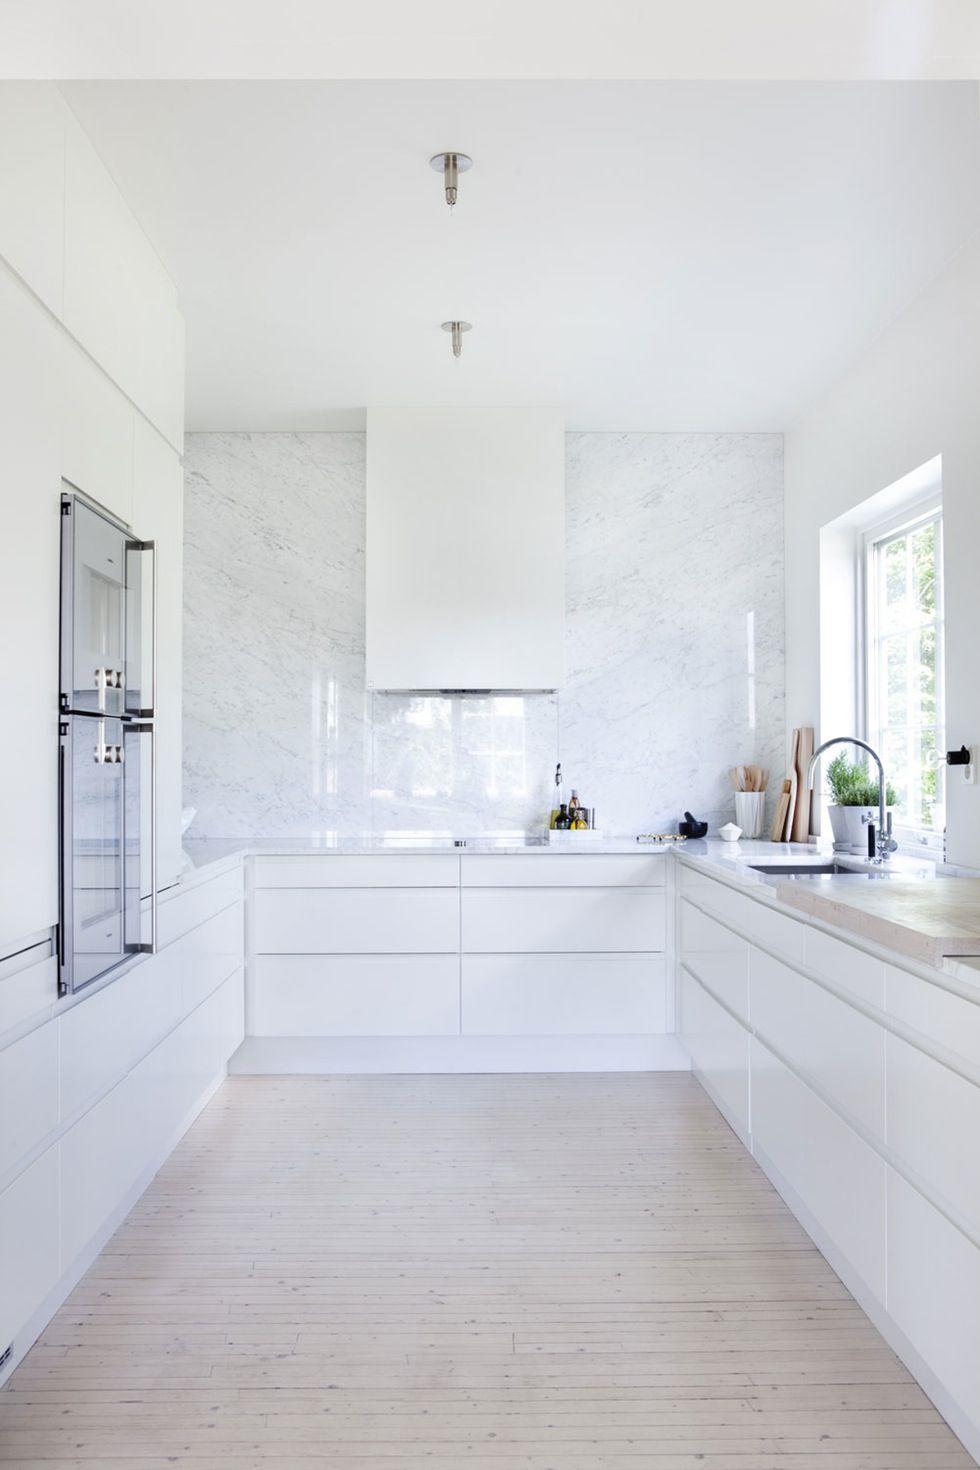 New kitchen in the making | Kitchens, Kitchen white and Interiors